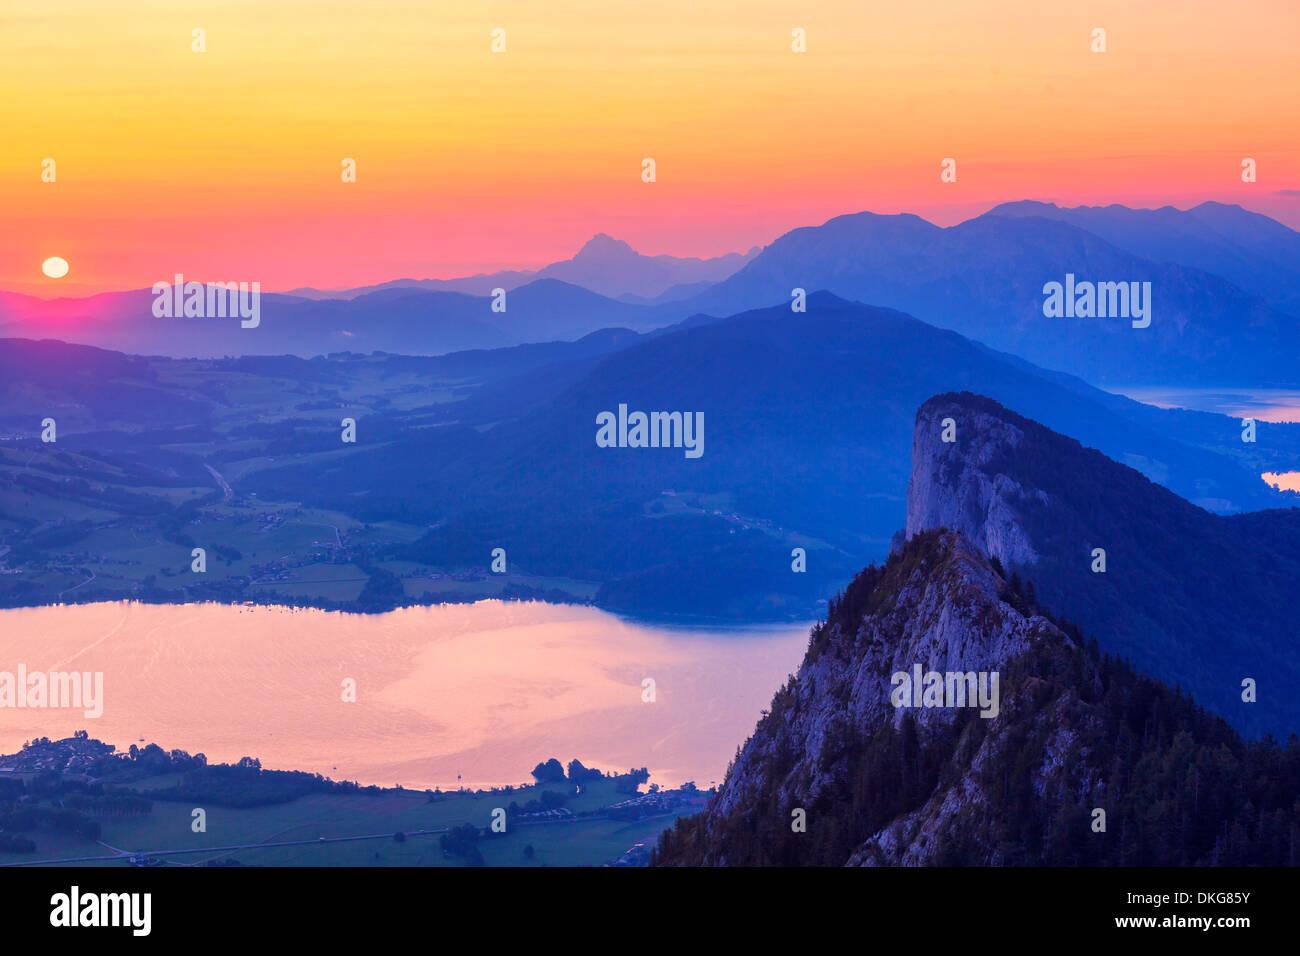 austria salzkammergut mondsee drachenwand mountain stockfotos austria salzkammergut mondsee. Black Bedroom Furniture Sets. Home Design Ideas